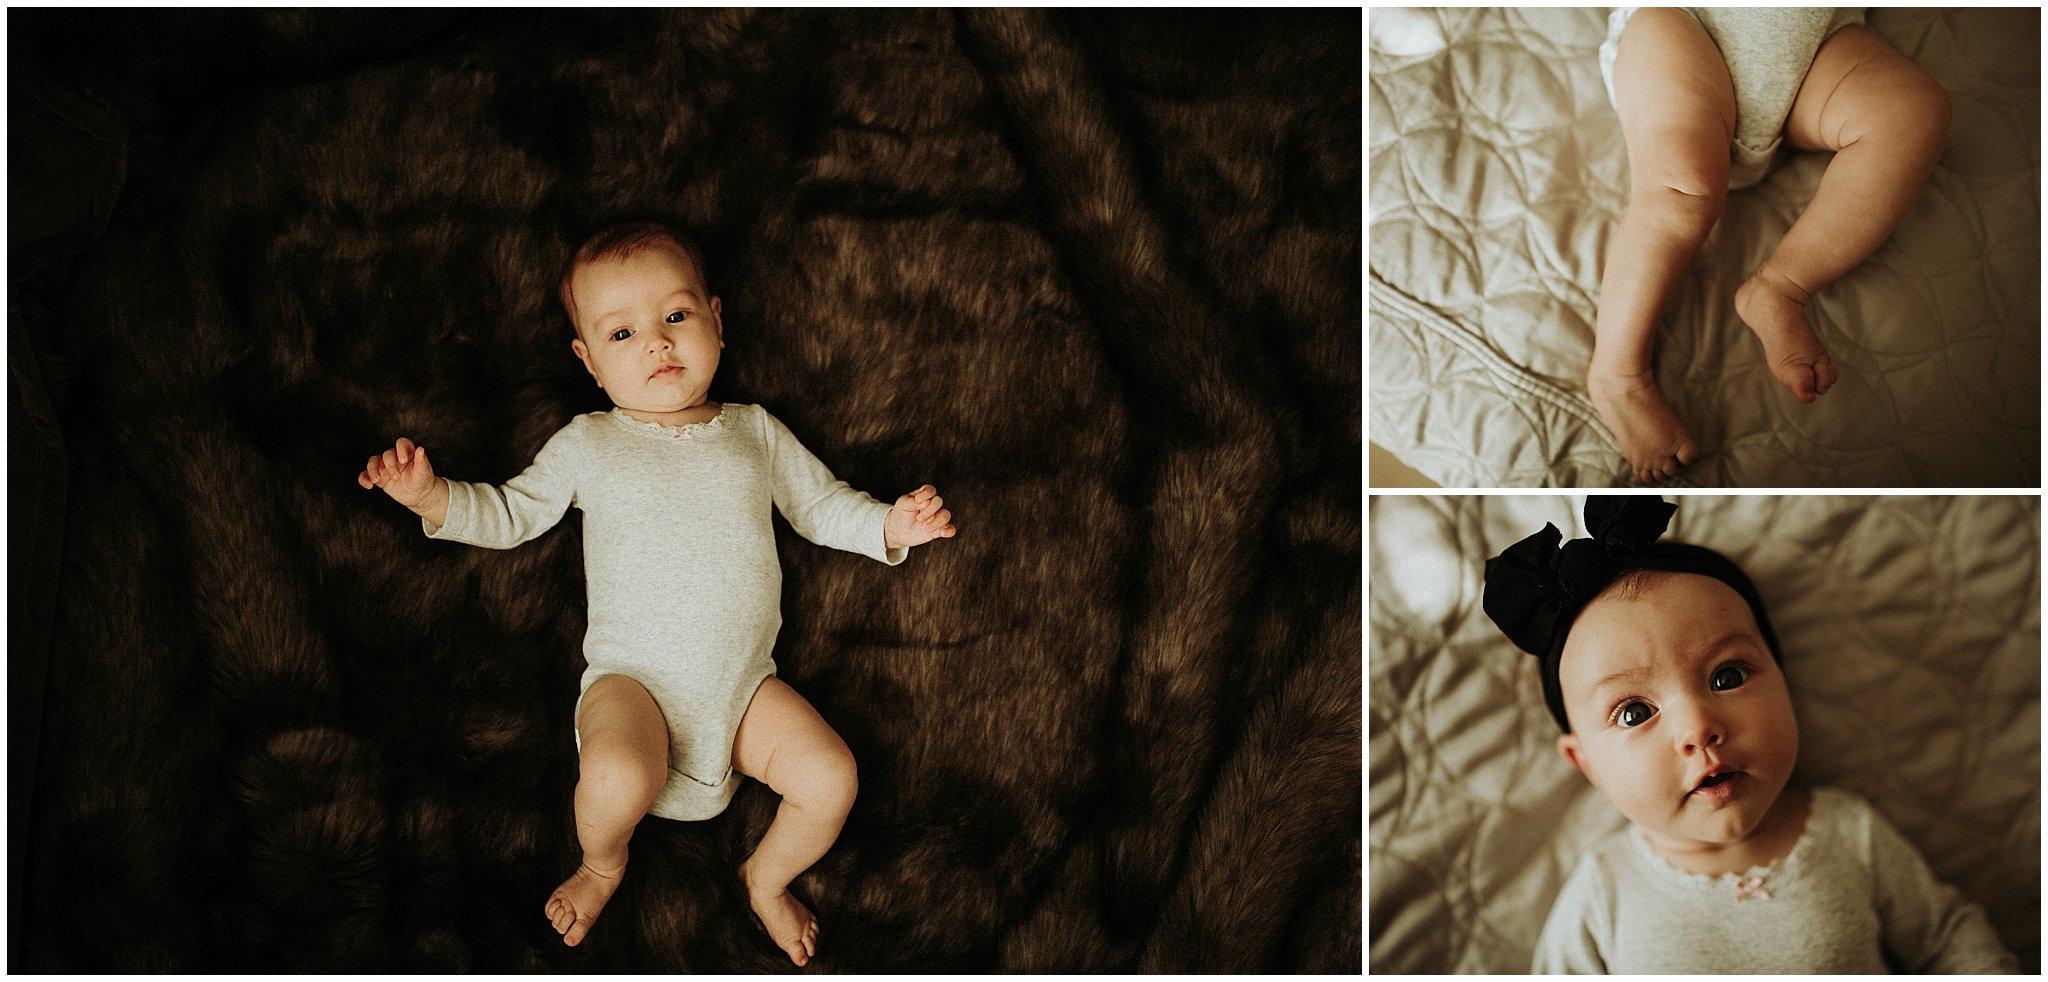 Newborn-Photographer-Bellingham-WA-Brianne-Bell-Photograpy-(Ila)-2